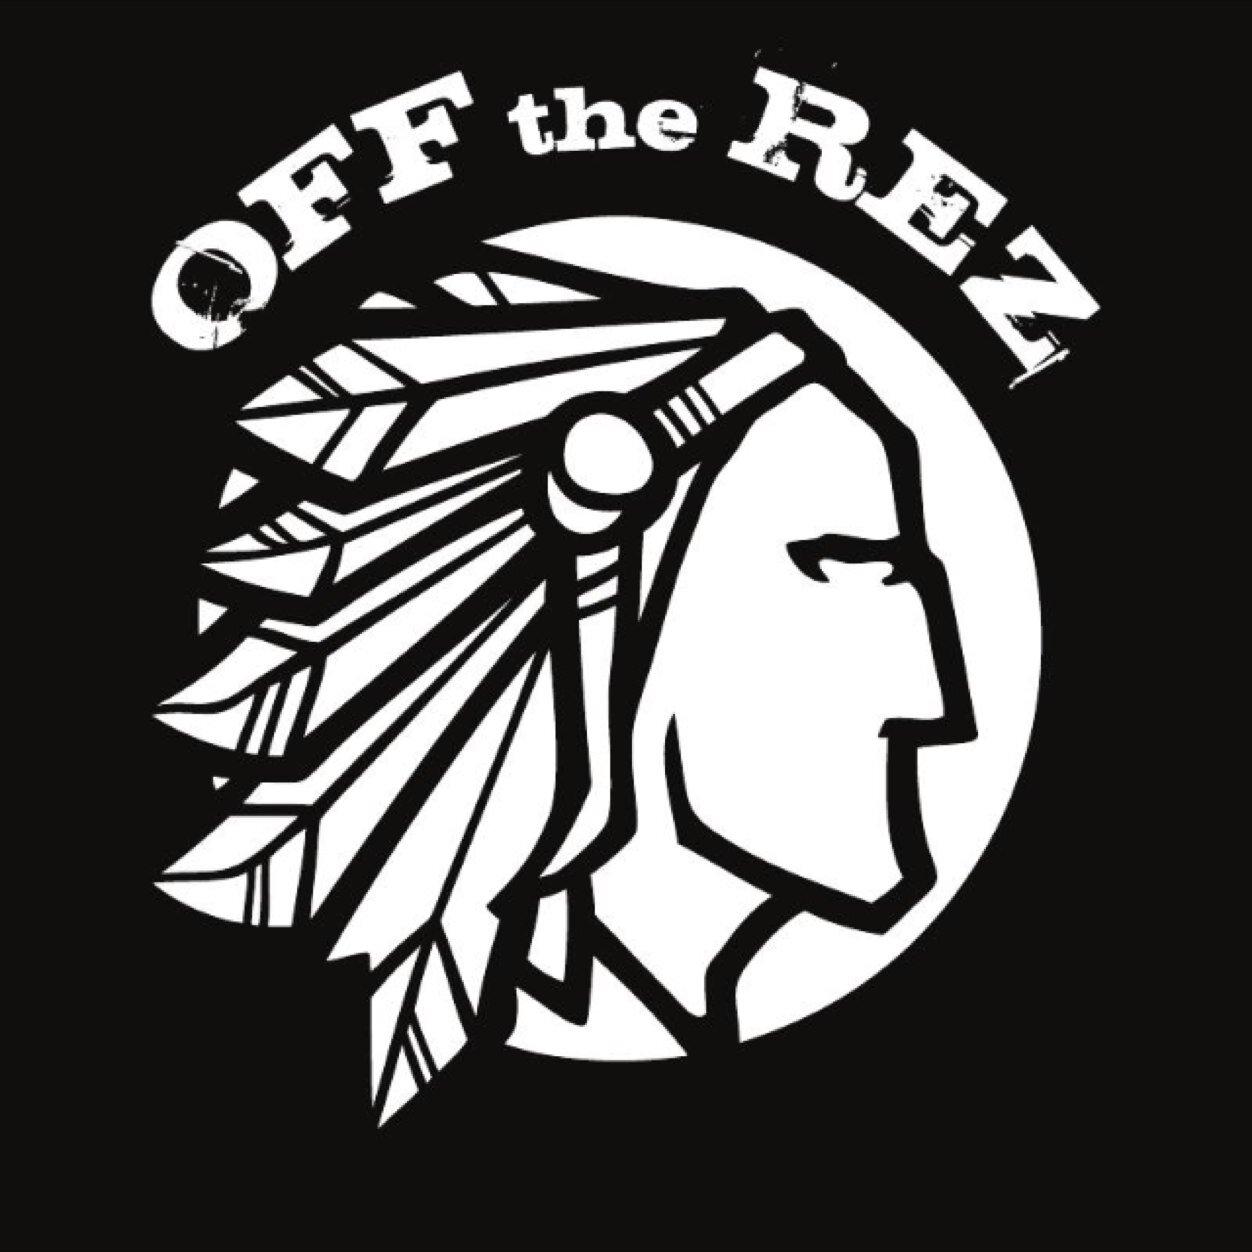 Off the Rez Truck